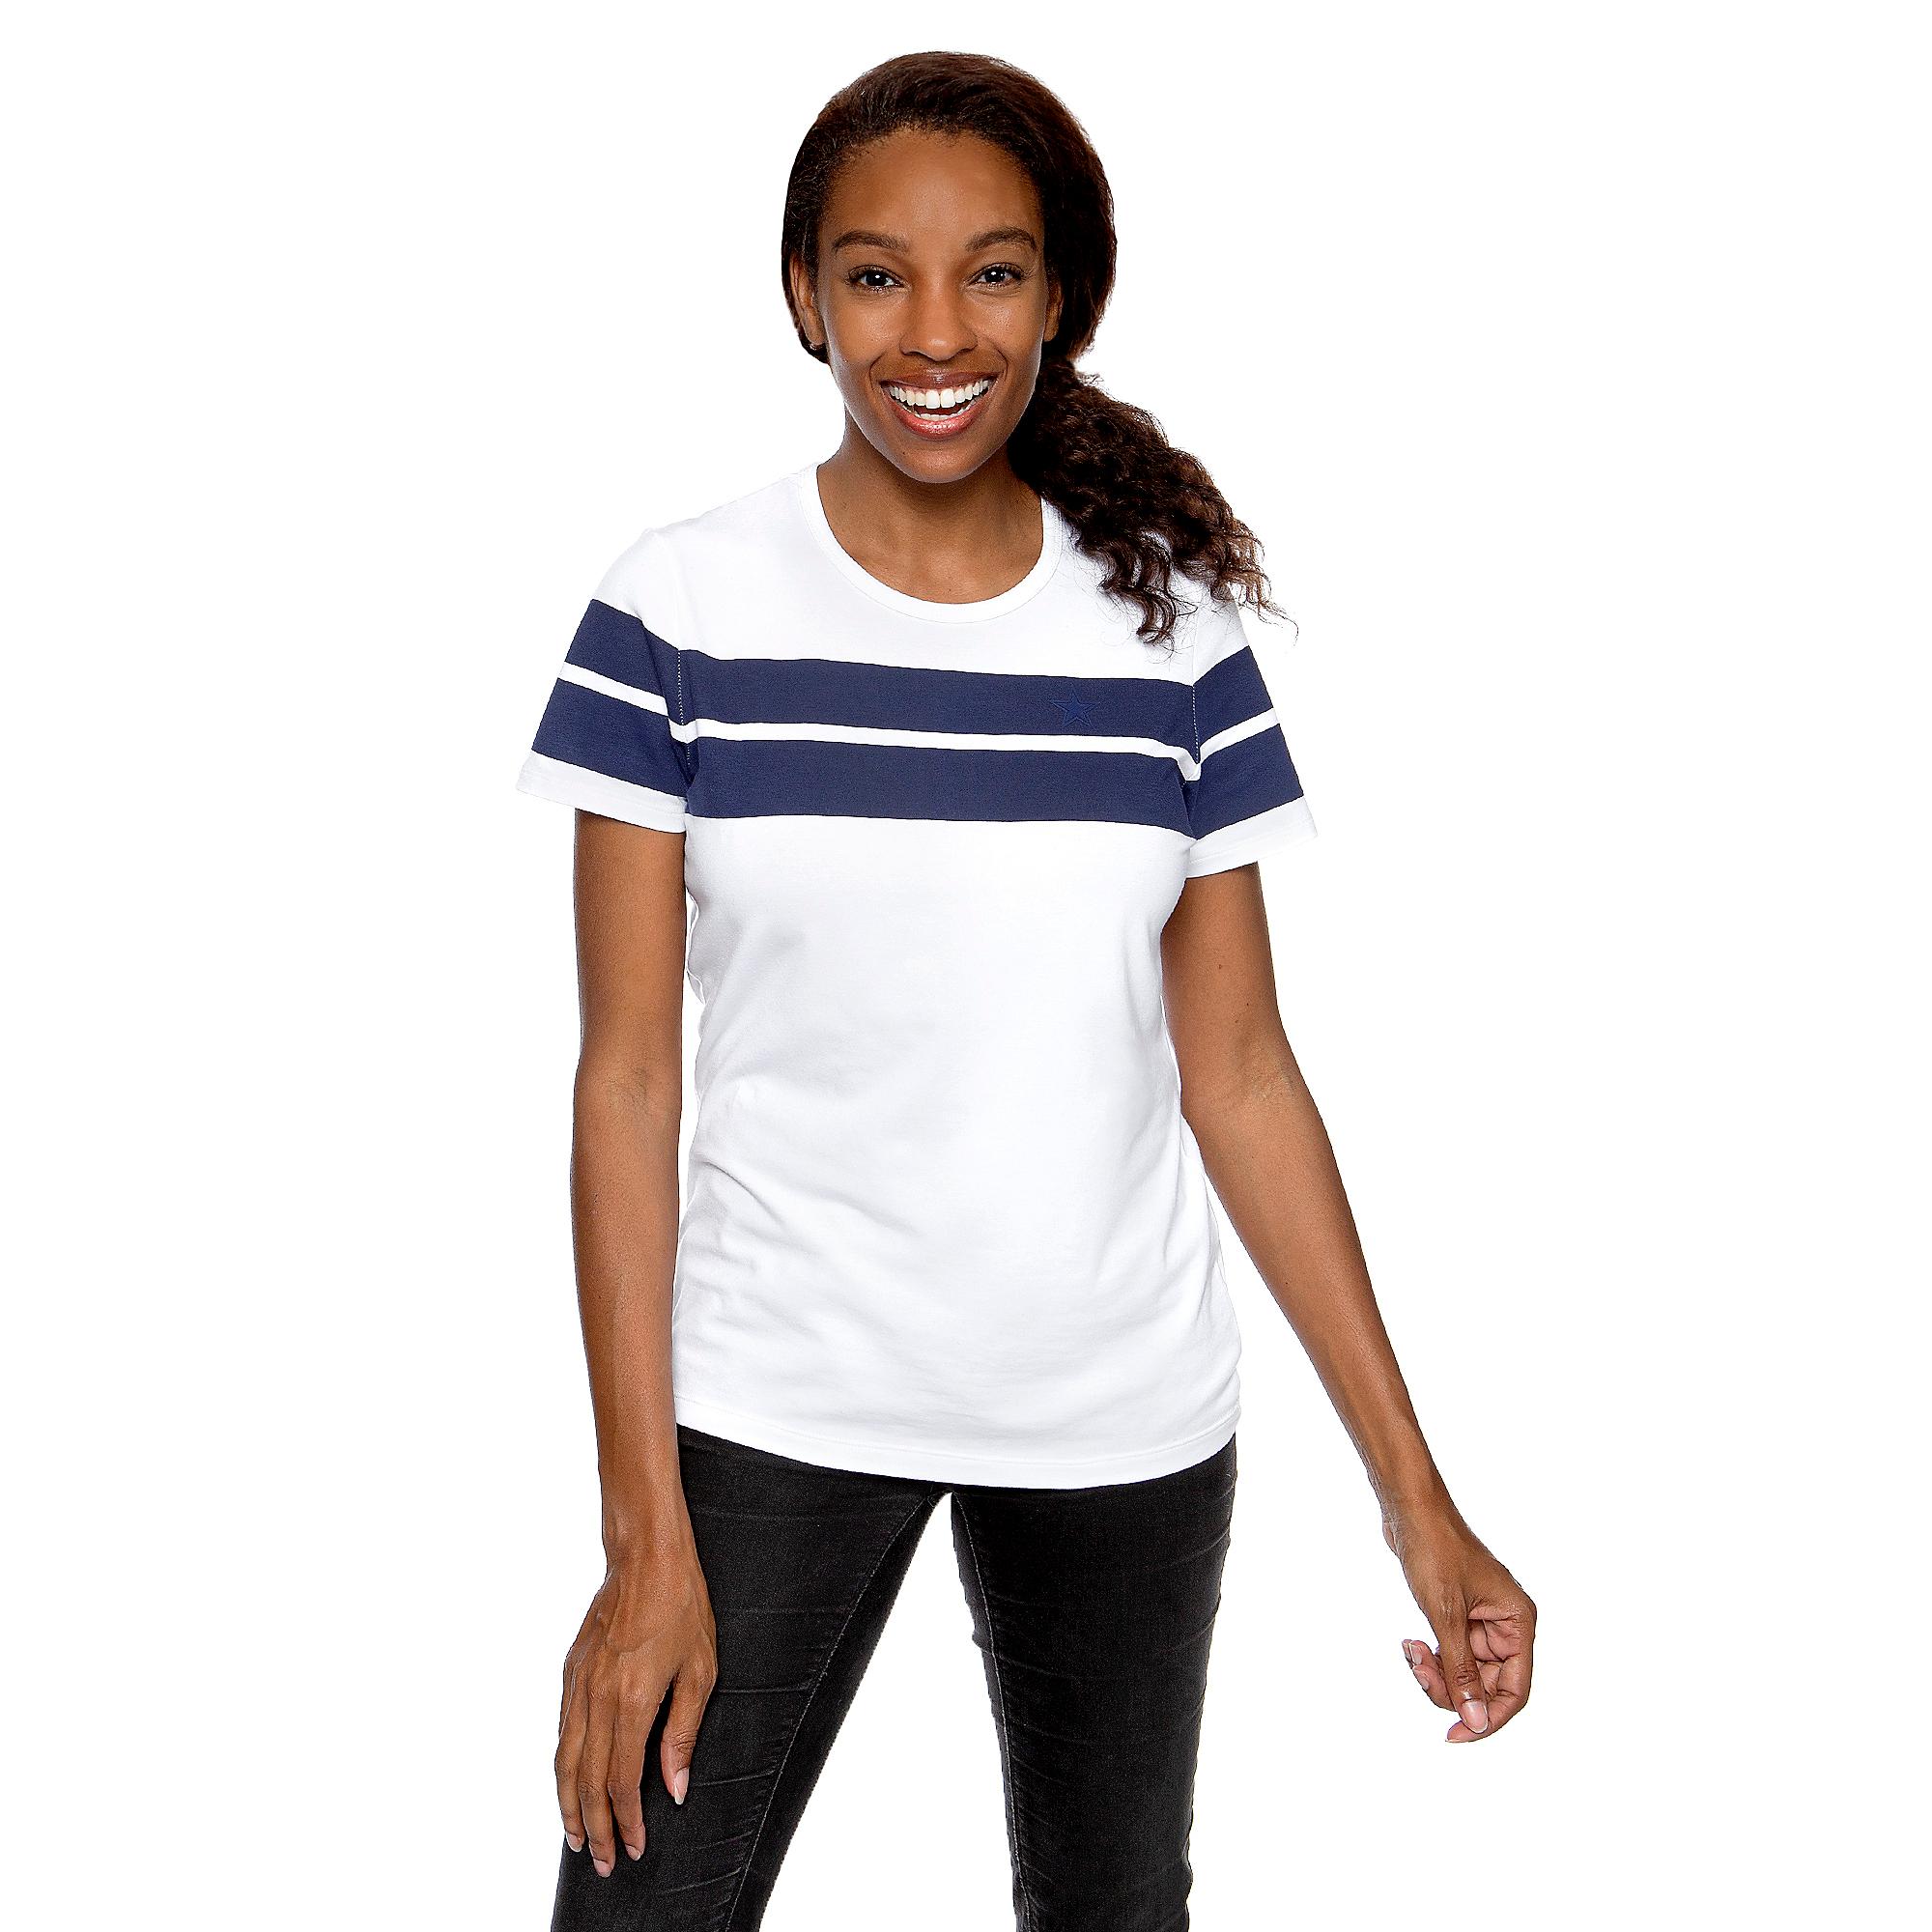 Dallas Cowboys WEAR By Erin Andrews Womens Striped Short Sleeve T-Shirt